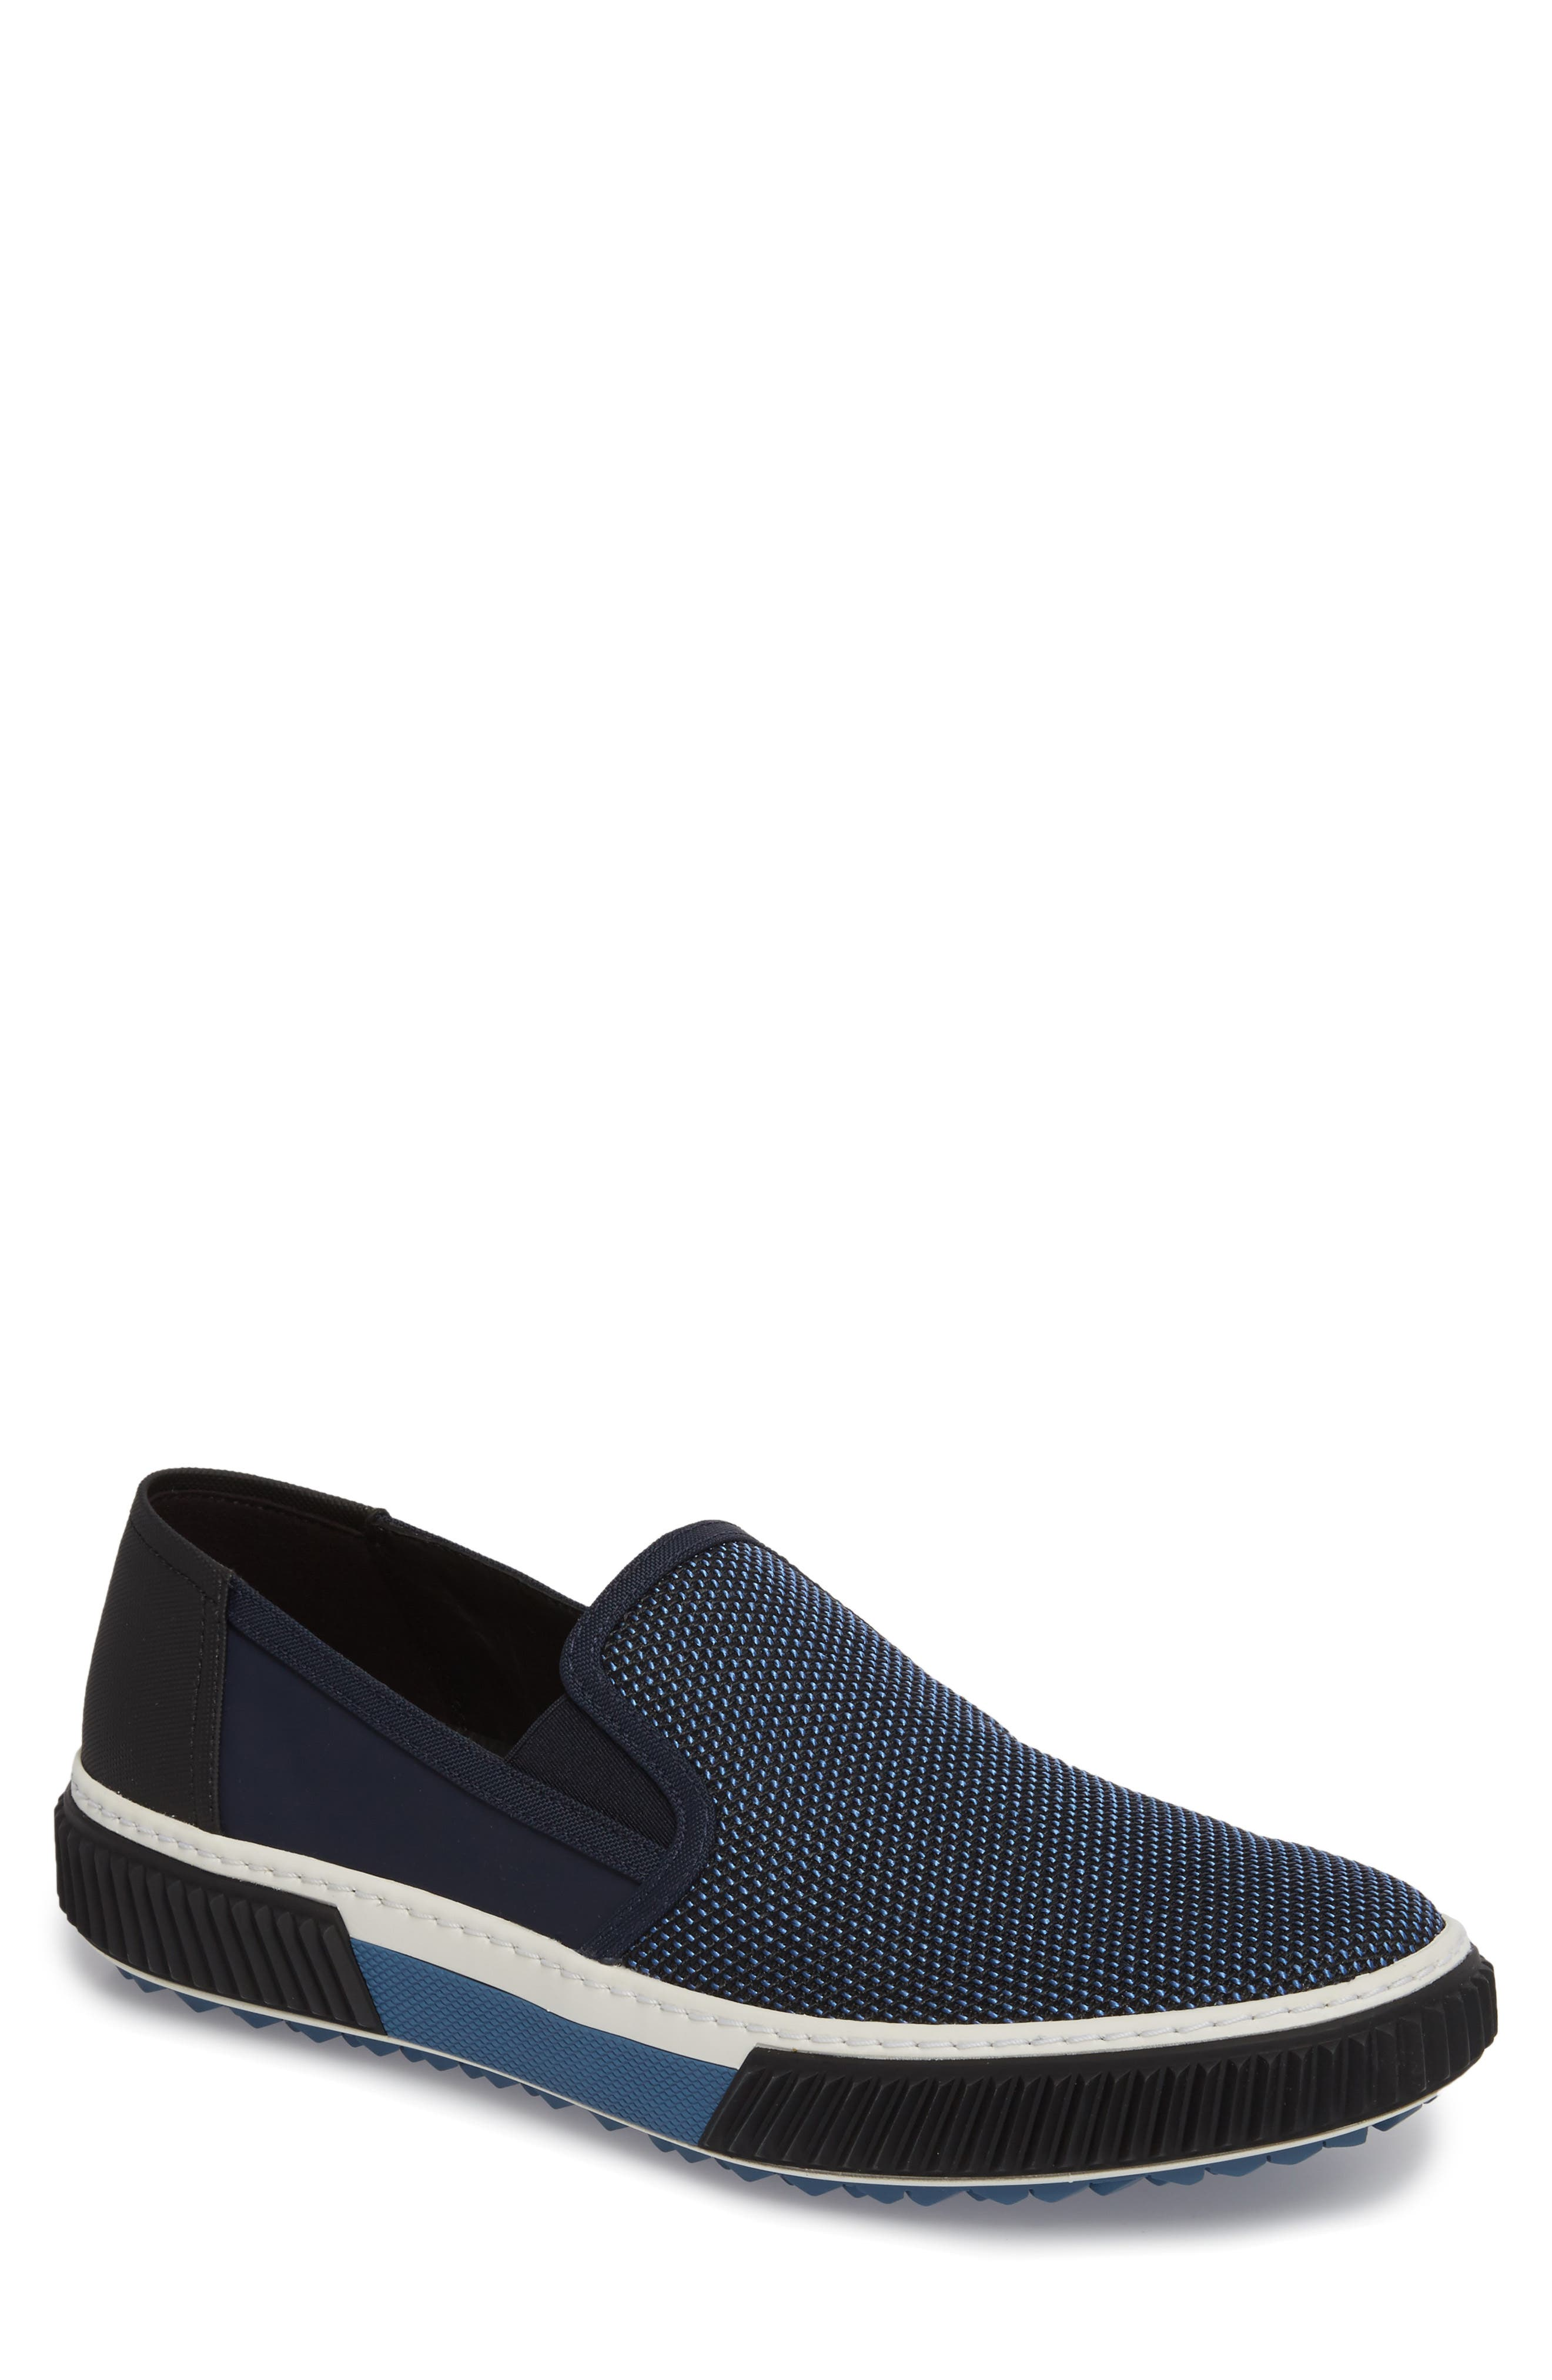 Linea Rossa Skate Slip-On,                         Main,                         color, Baltic Blue